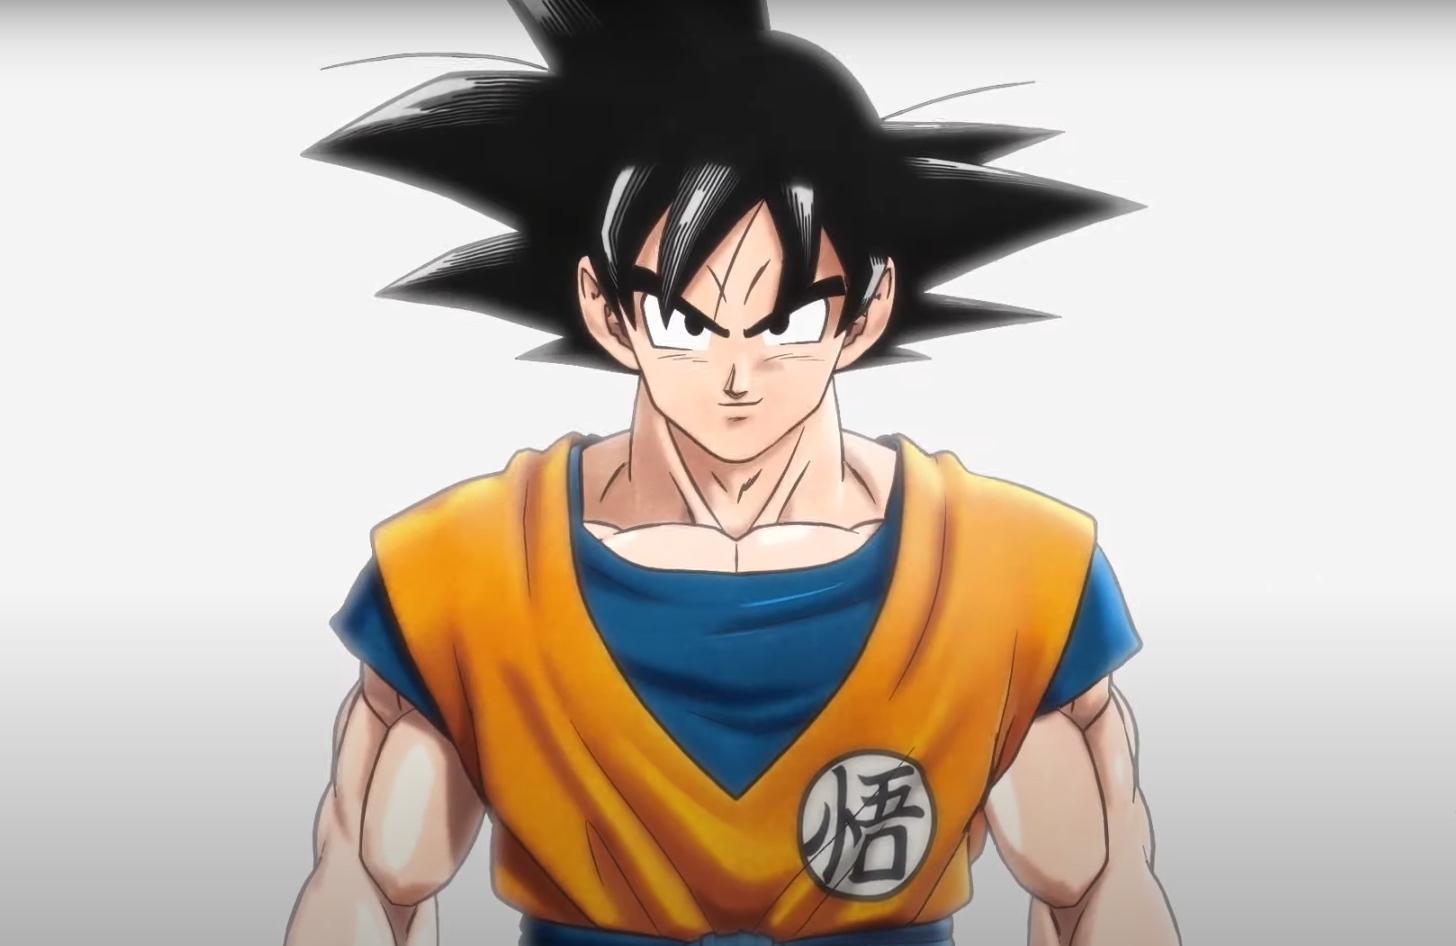 Goku from the teaser trailer for Dragon Ball Super: Superhero